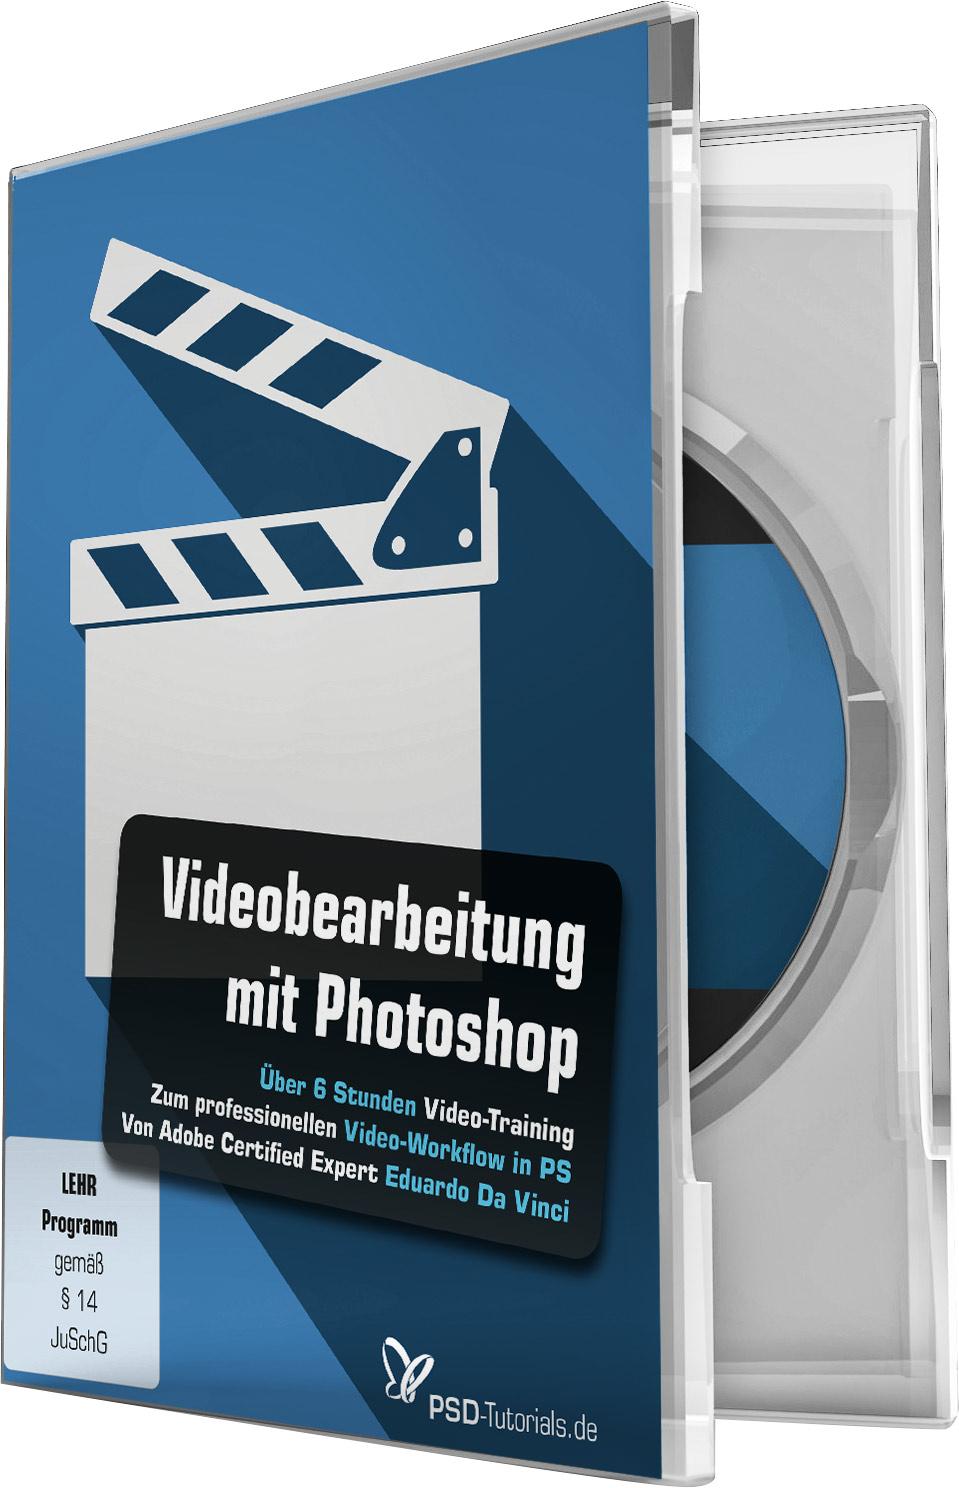 videobearbeitung mit photoshop psd shop. Black Bedroom Furniture Sets. Home Design Ideas